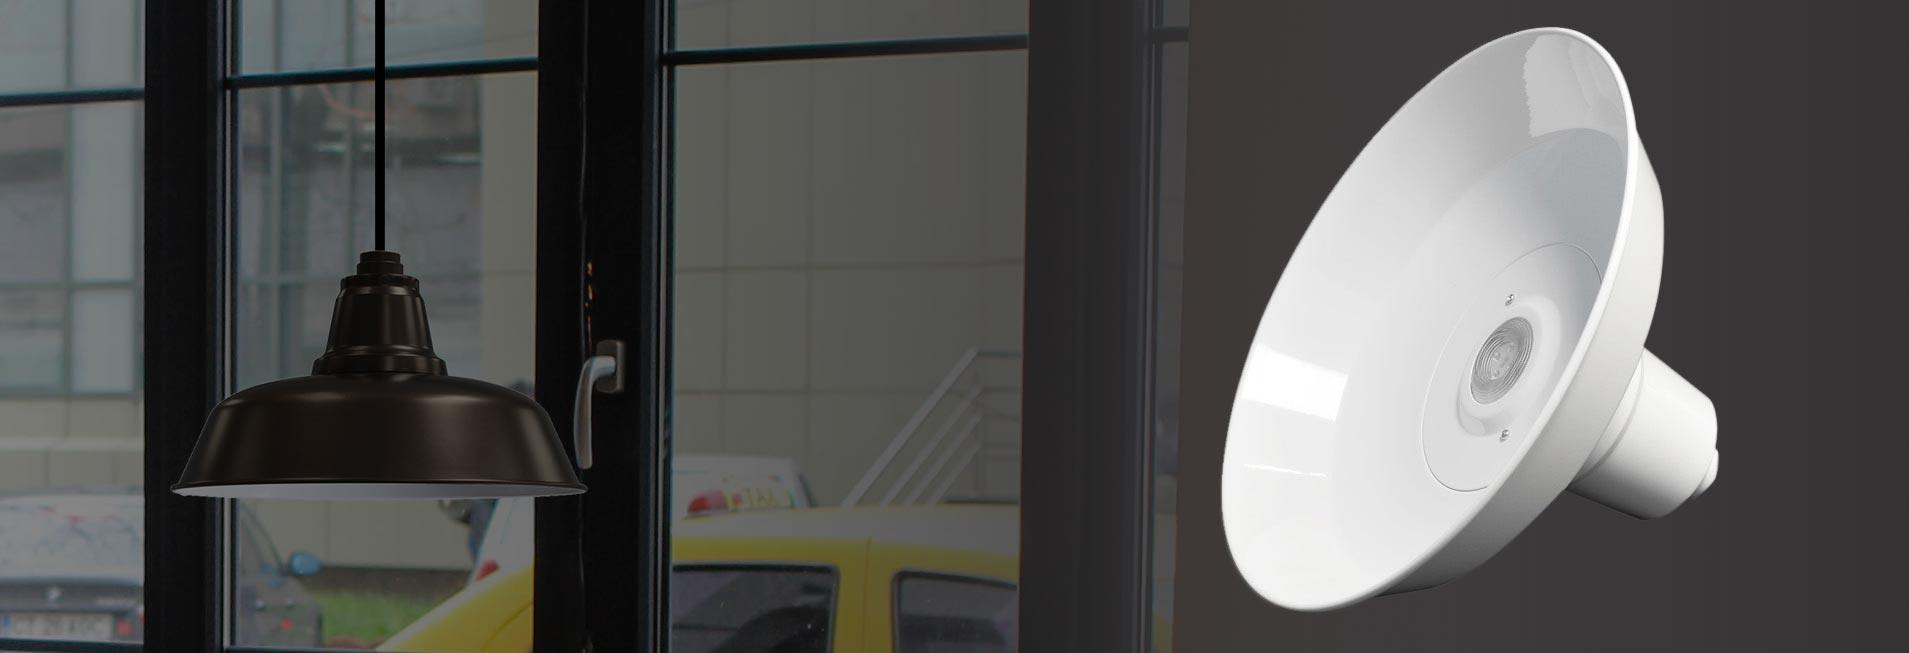 Goodyear LED Pendant Light weatherproof lifestyle